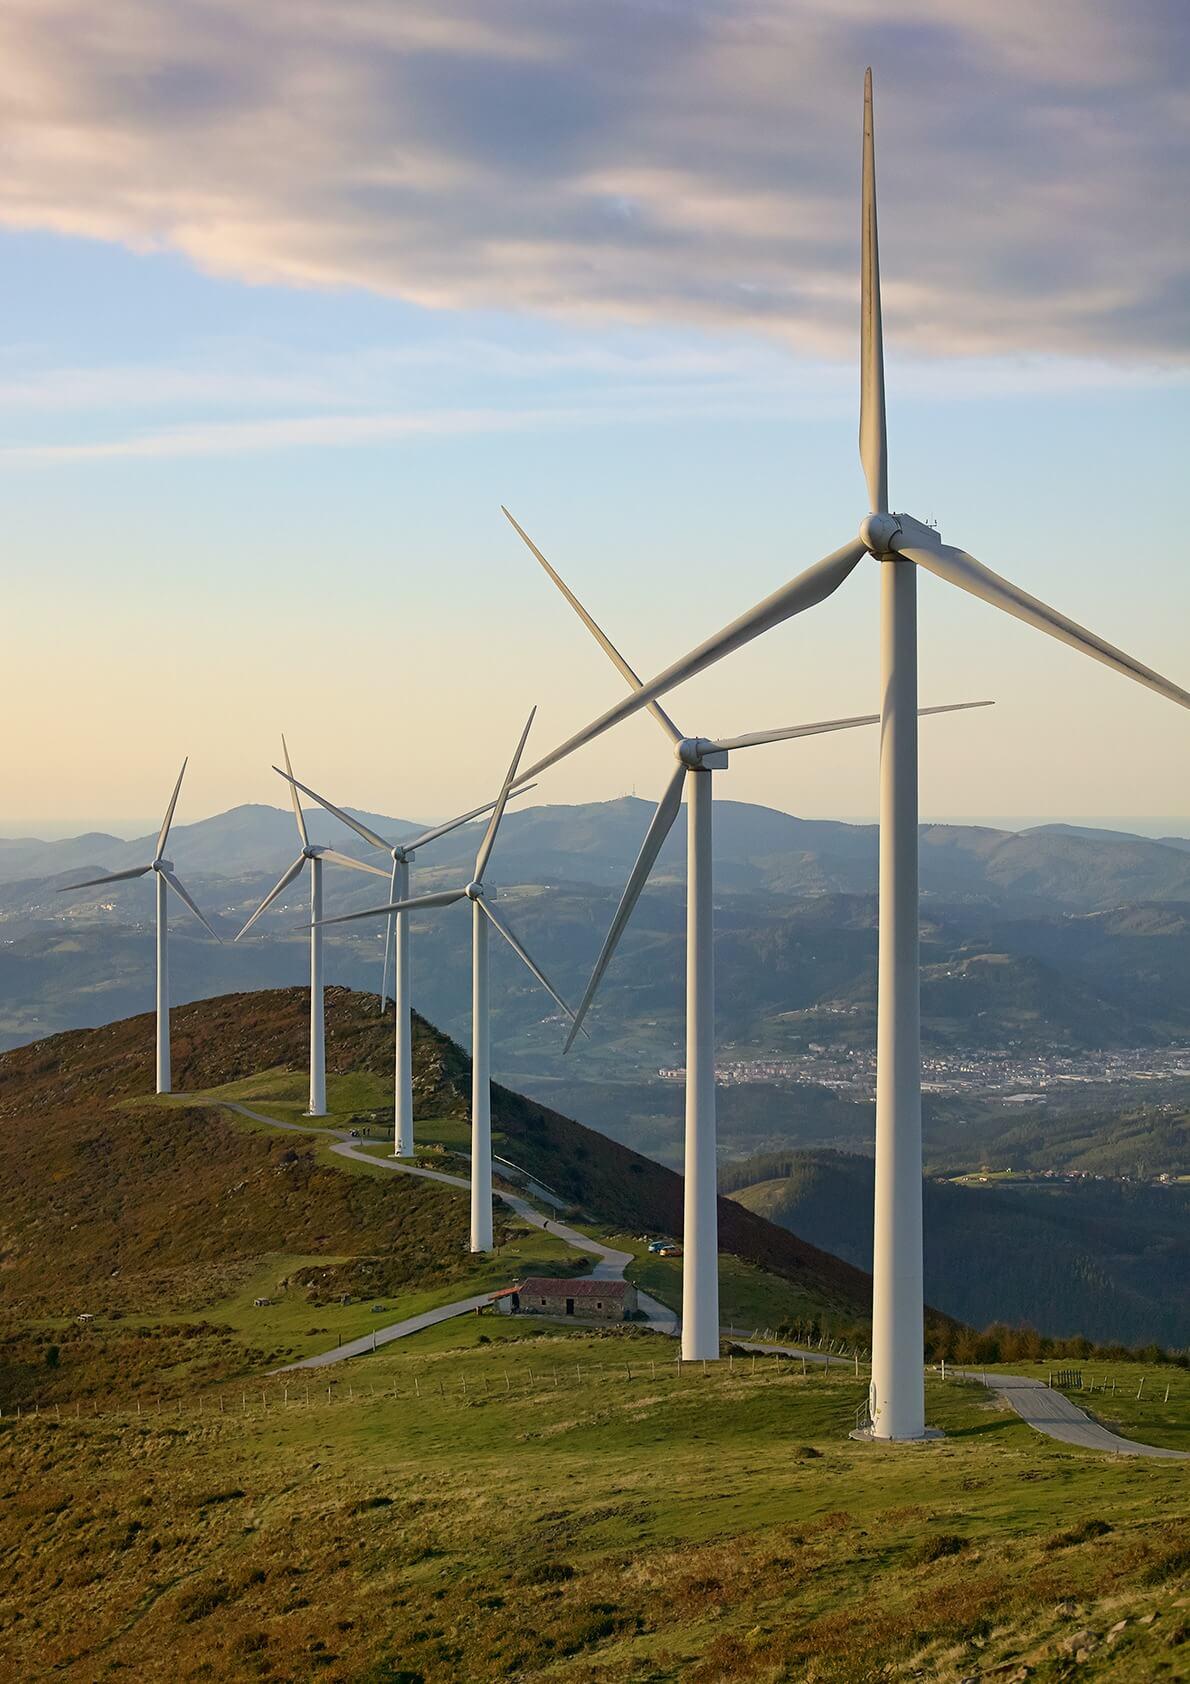 prekybos vėjo sistema